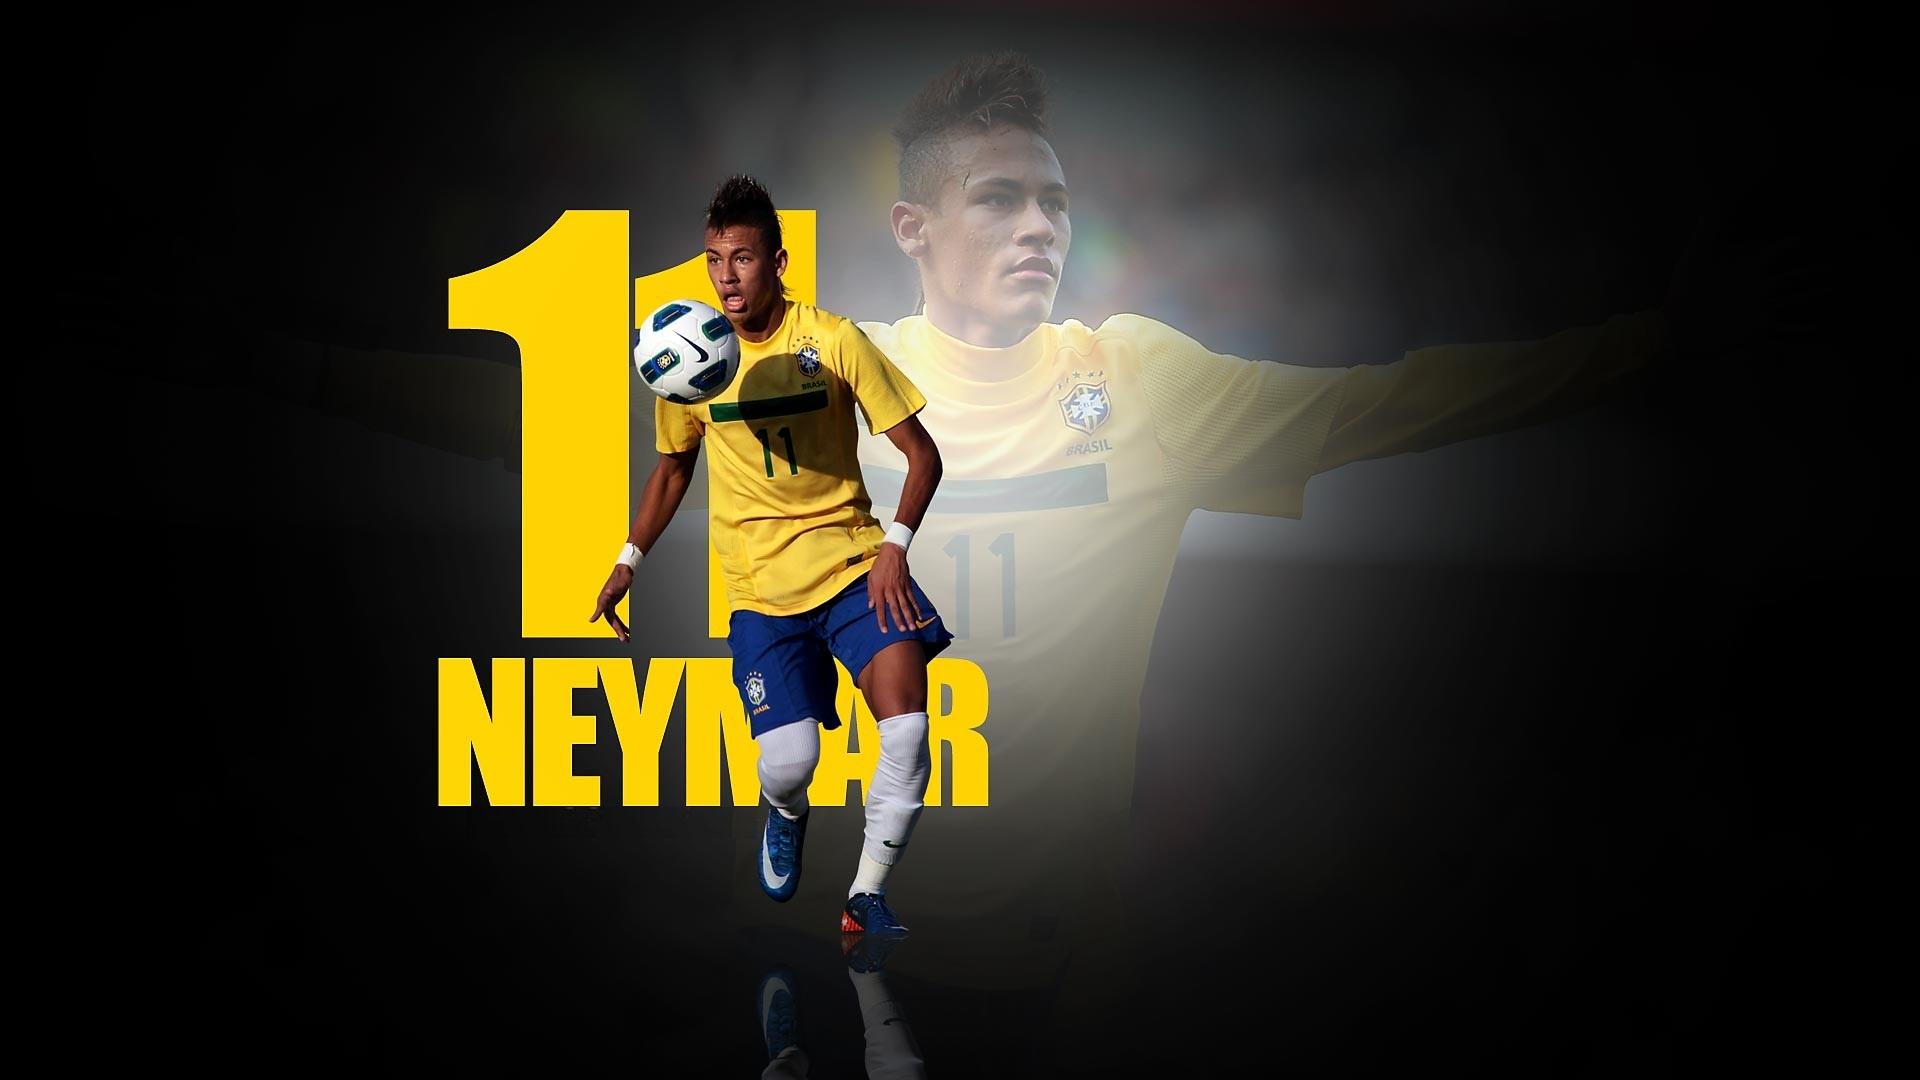 Fc Barcelona Live Wallpaper 3d Neymar Wallpapers 2018